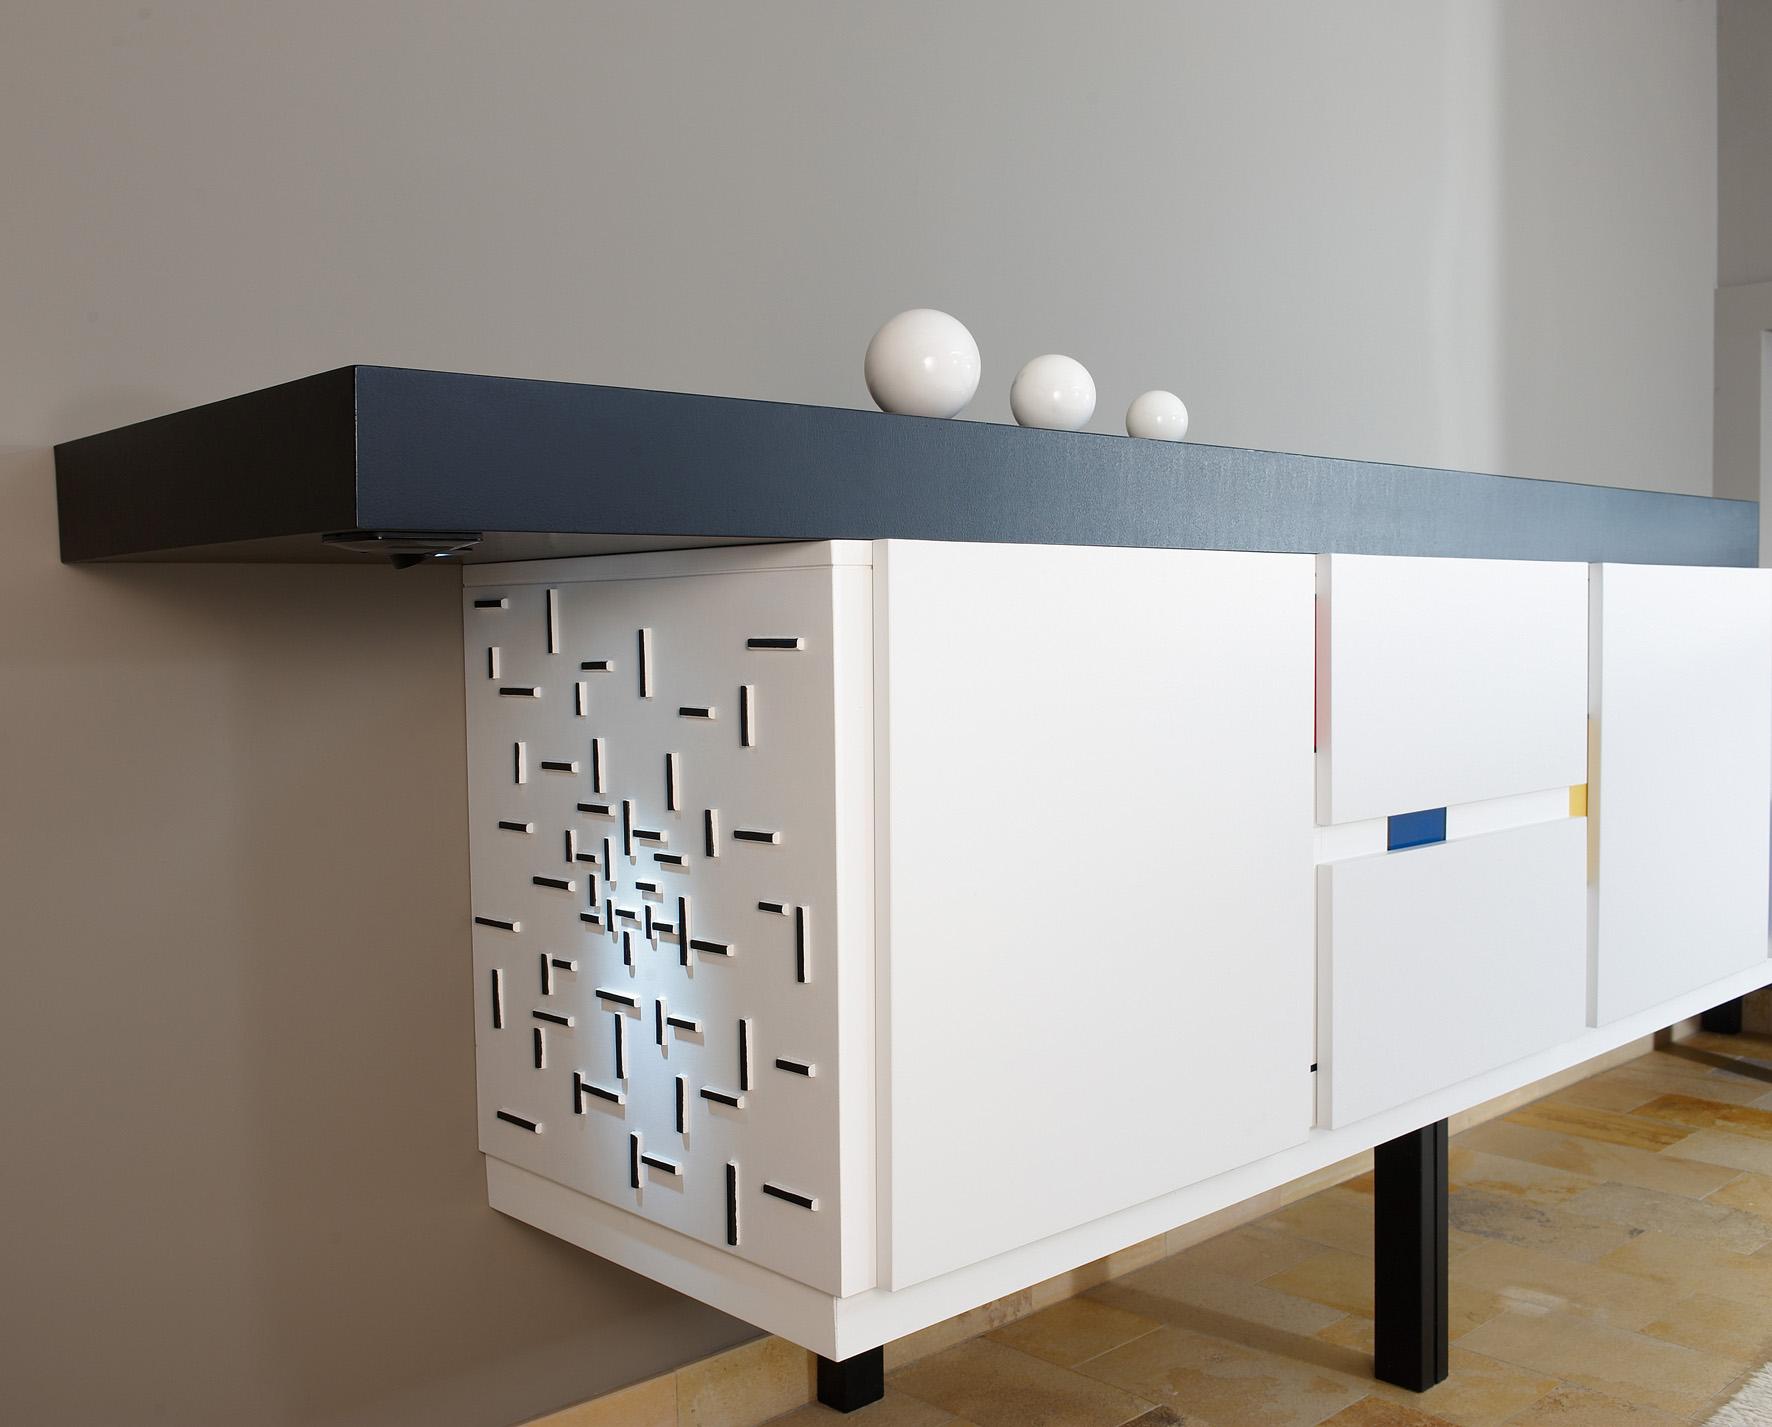 meuble mondrian c interieur. Black Bedroom Furniture Sets. Home Design Ideas